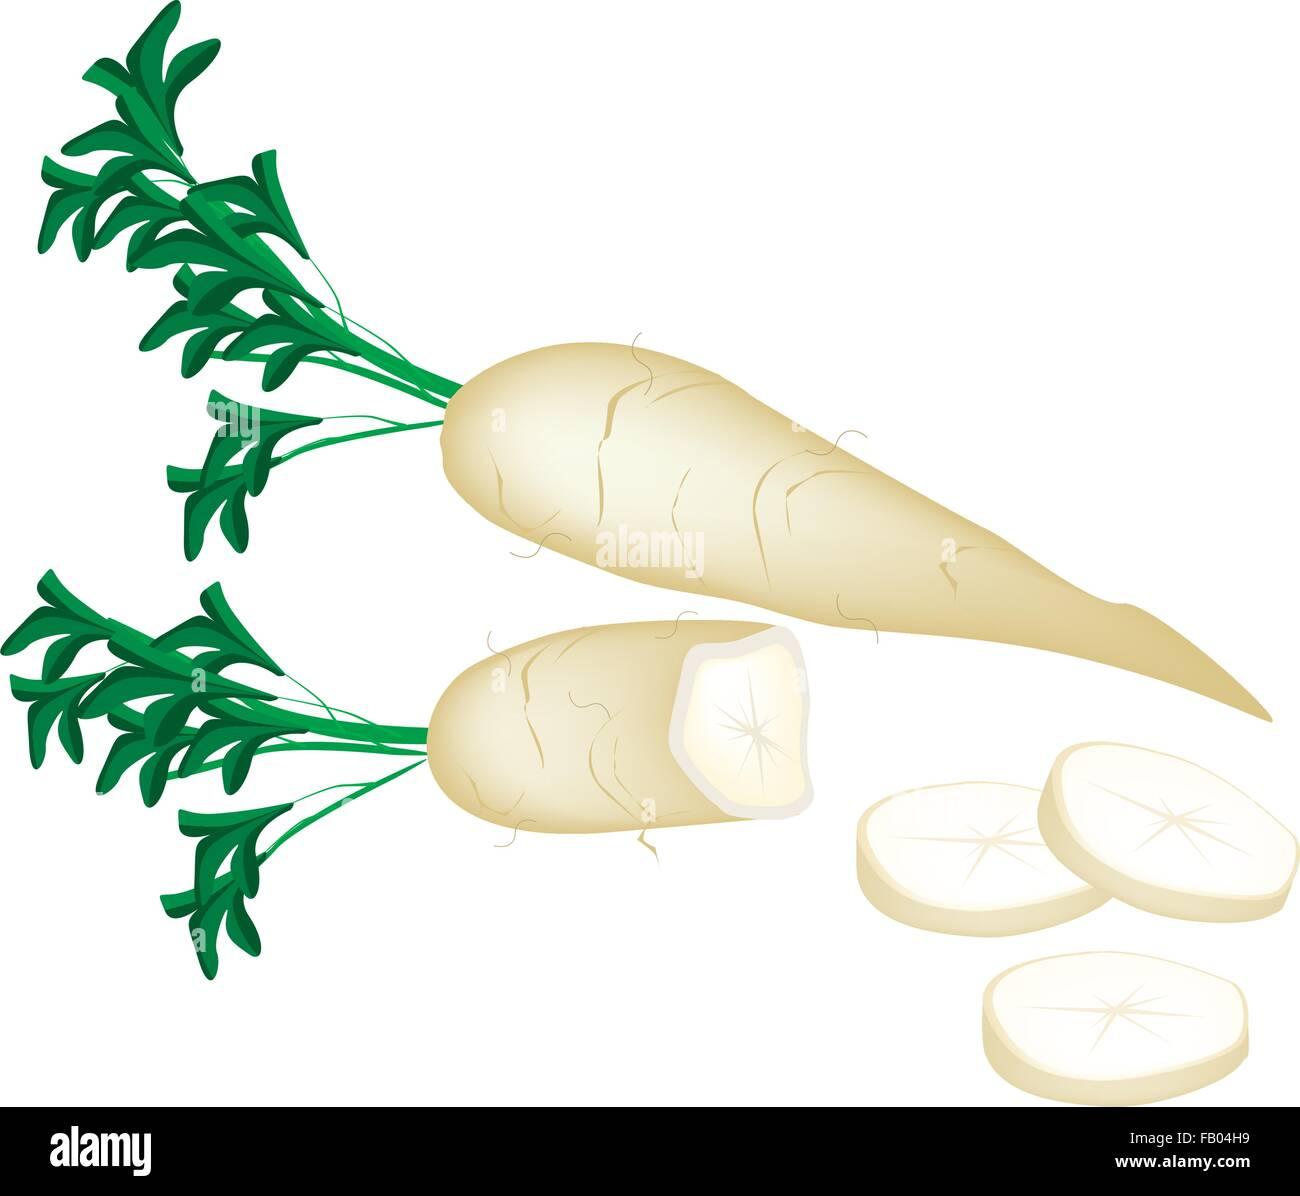 Vegetable, Vector Illustration of Long and Slices White Radishes or Daikon Radishes Isolated on White Background - Stock Image